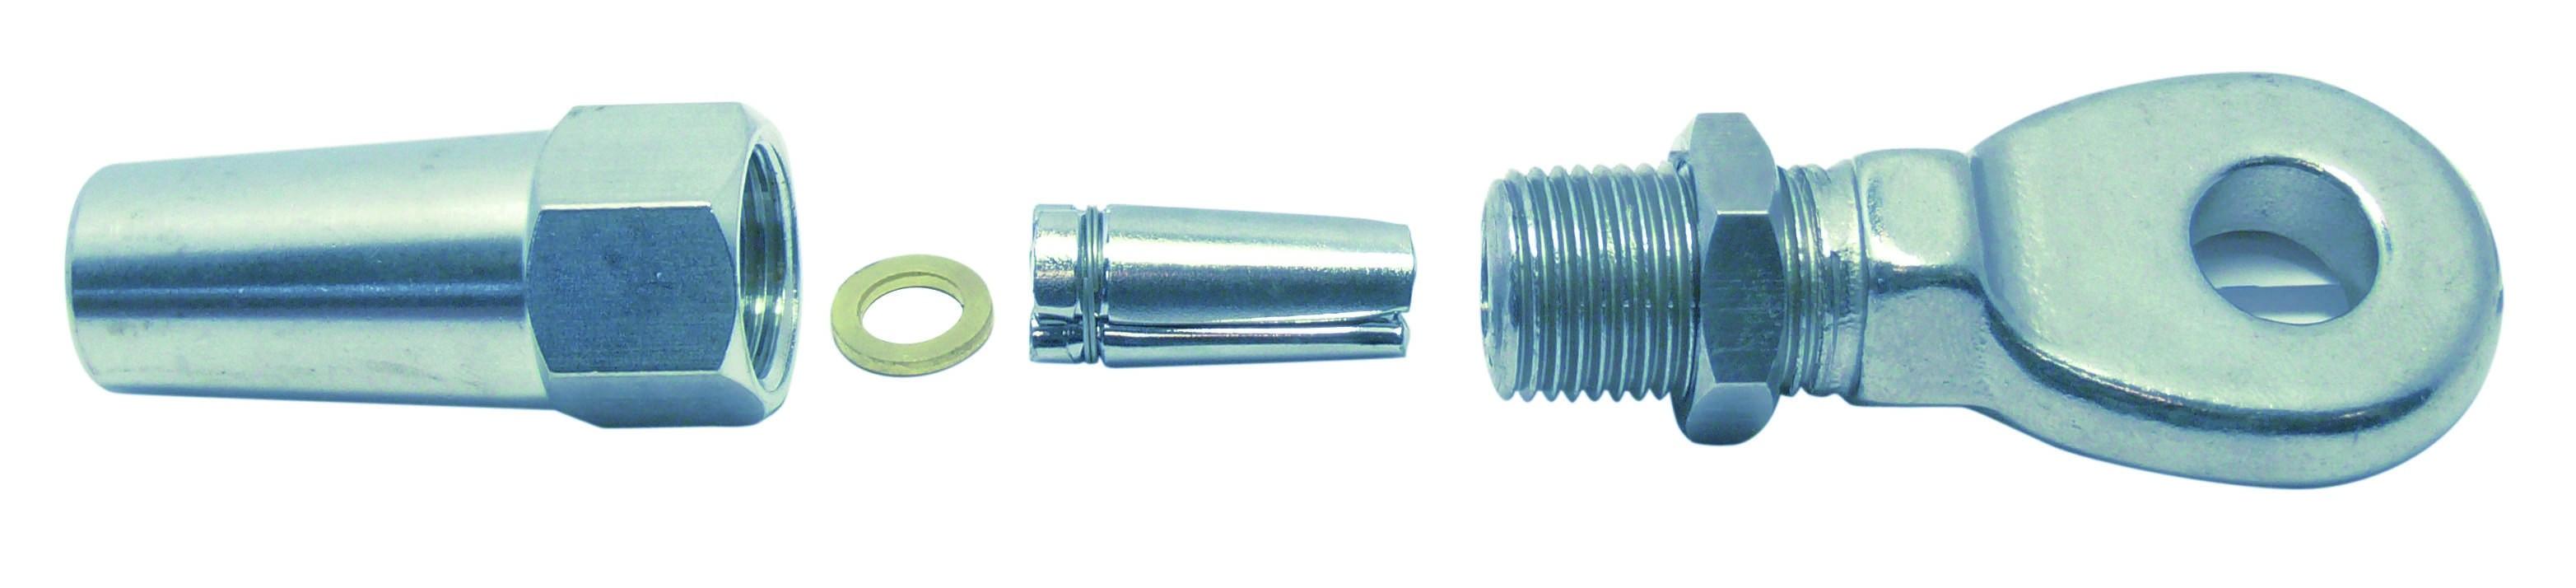 DHZ-oogterminal 4mm RVS A4 1 stuks